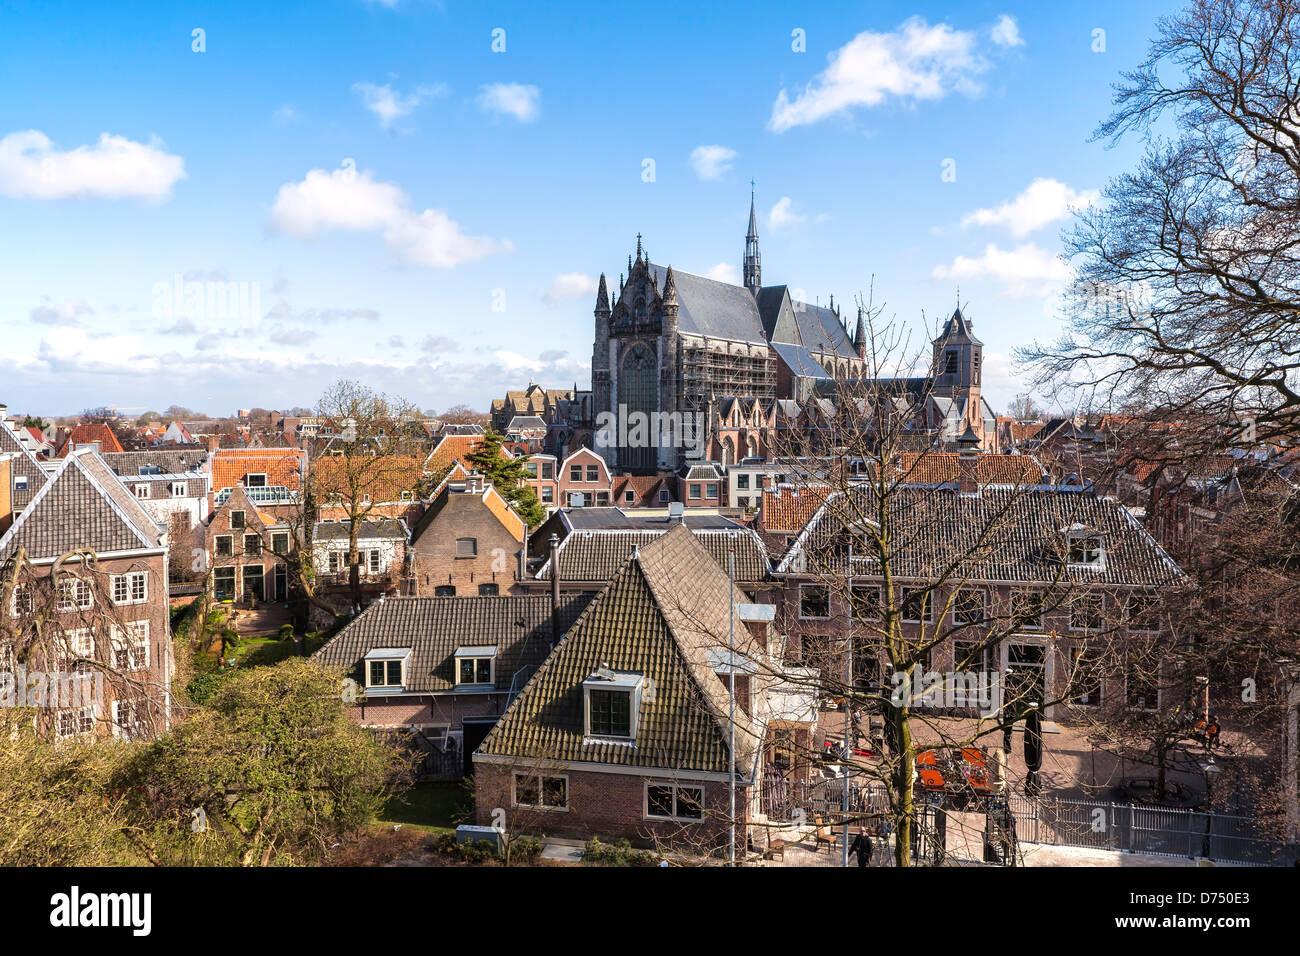 Hooglandse Kerk in Leiden, South Holland, Netherlands Stock Photo